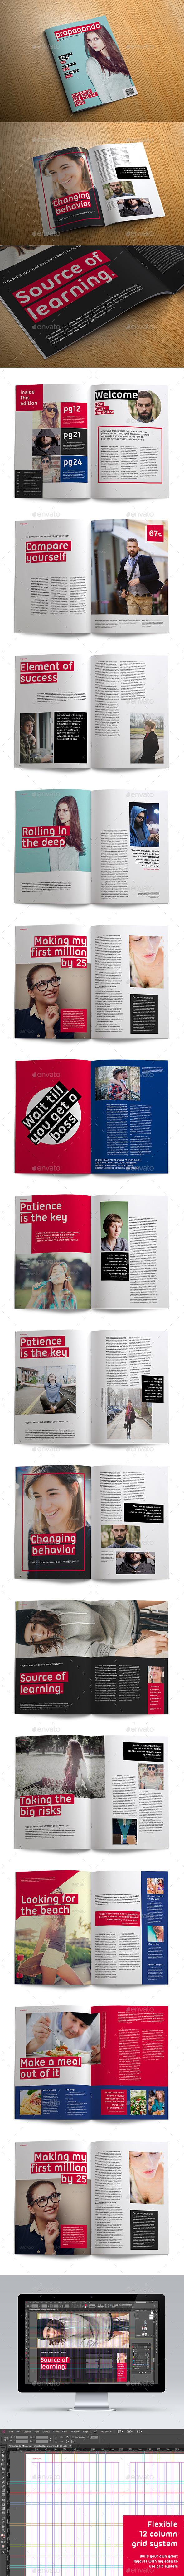 Propaganda Magazine - Magazines Print Templates